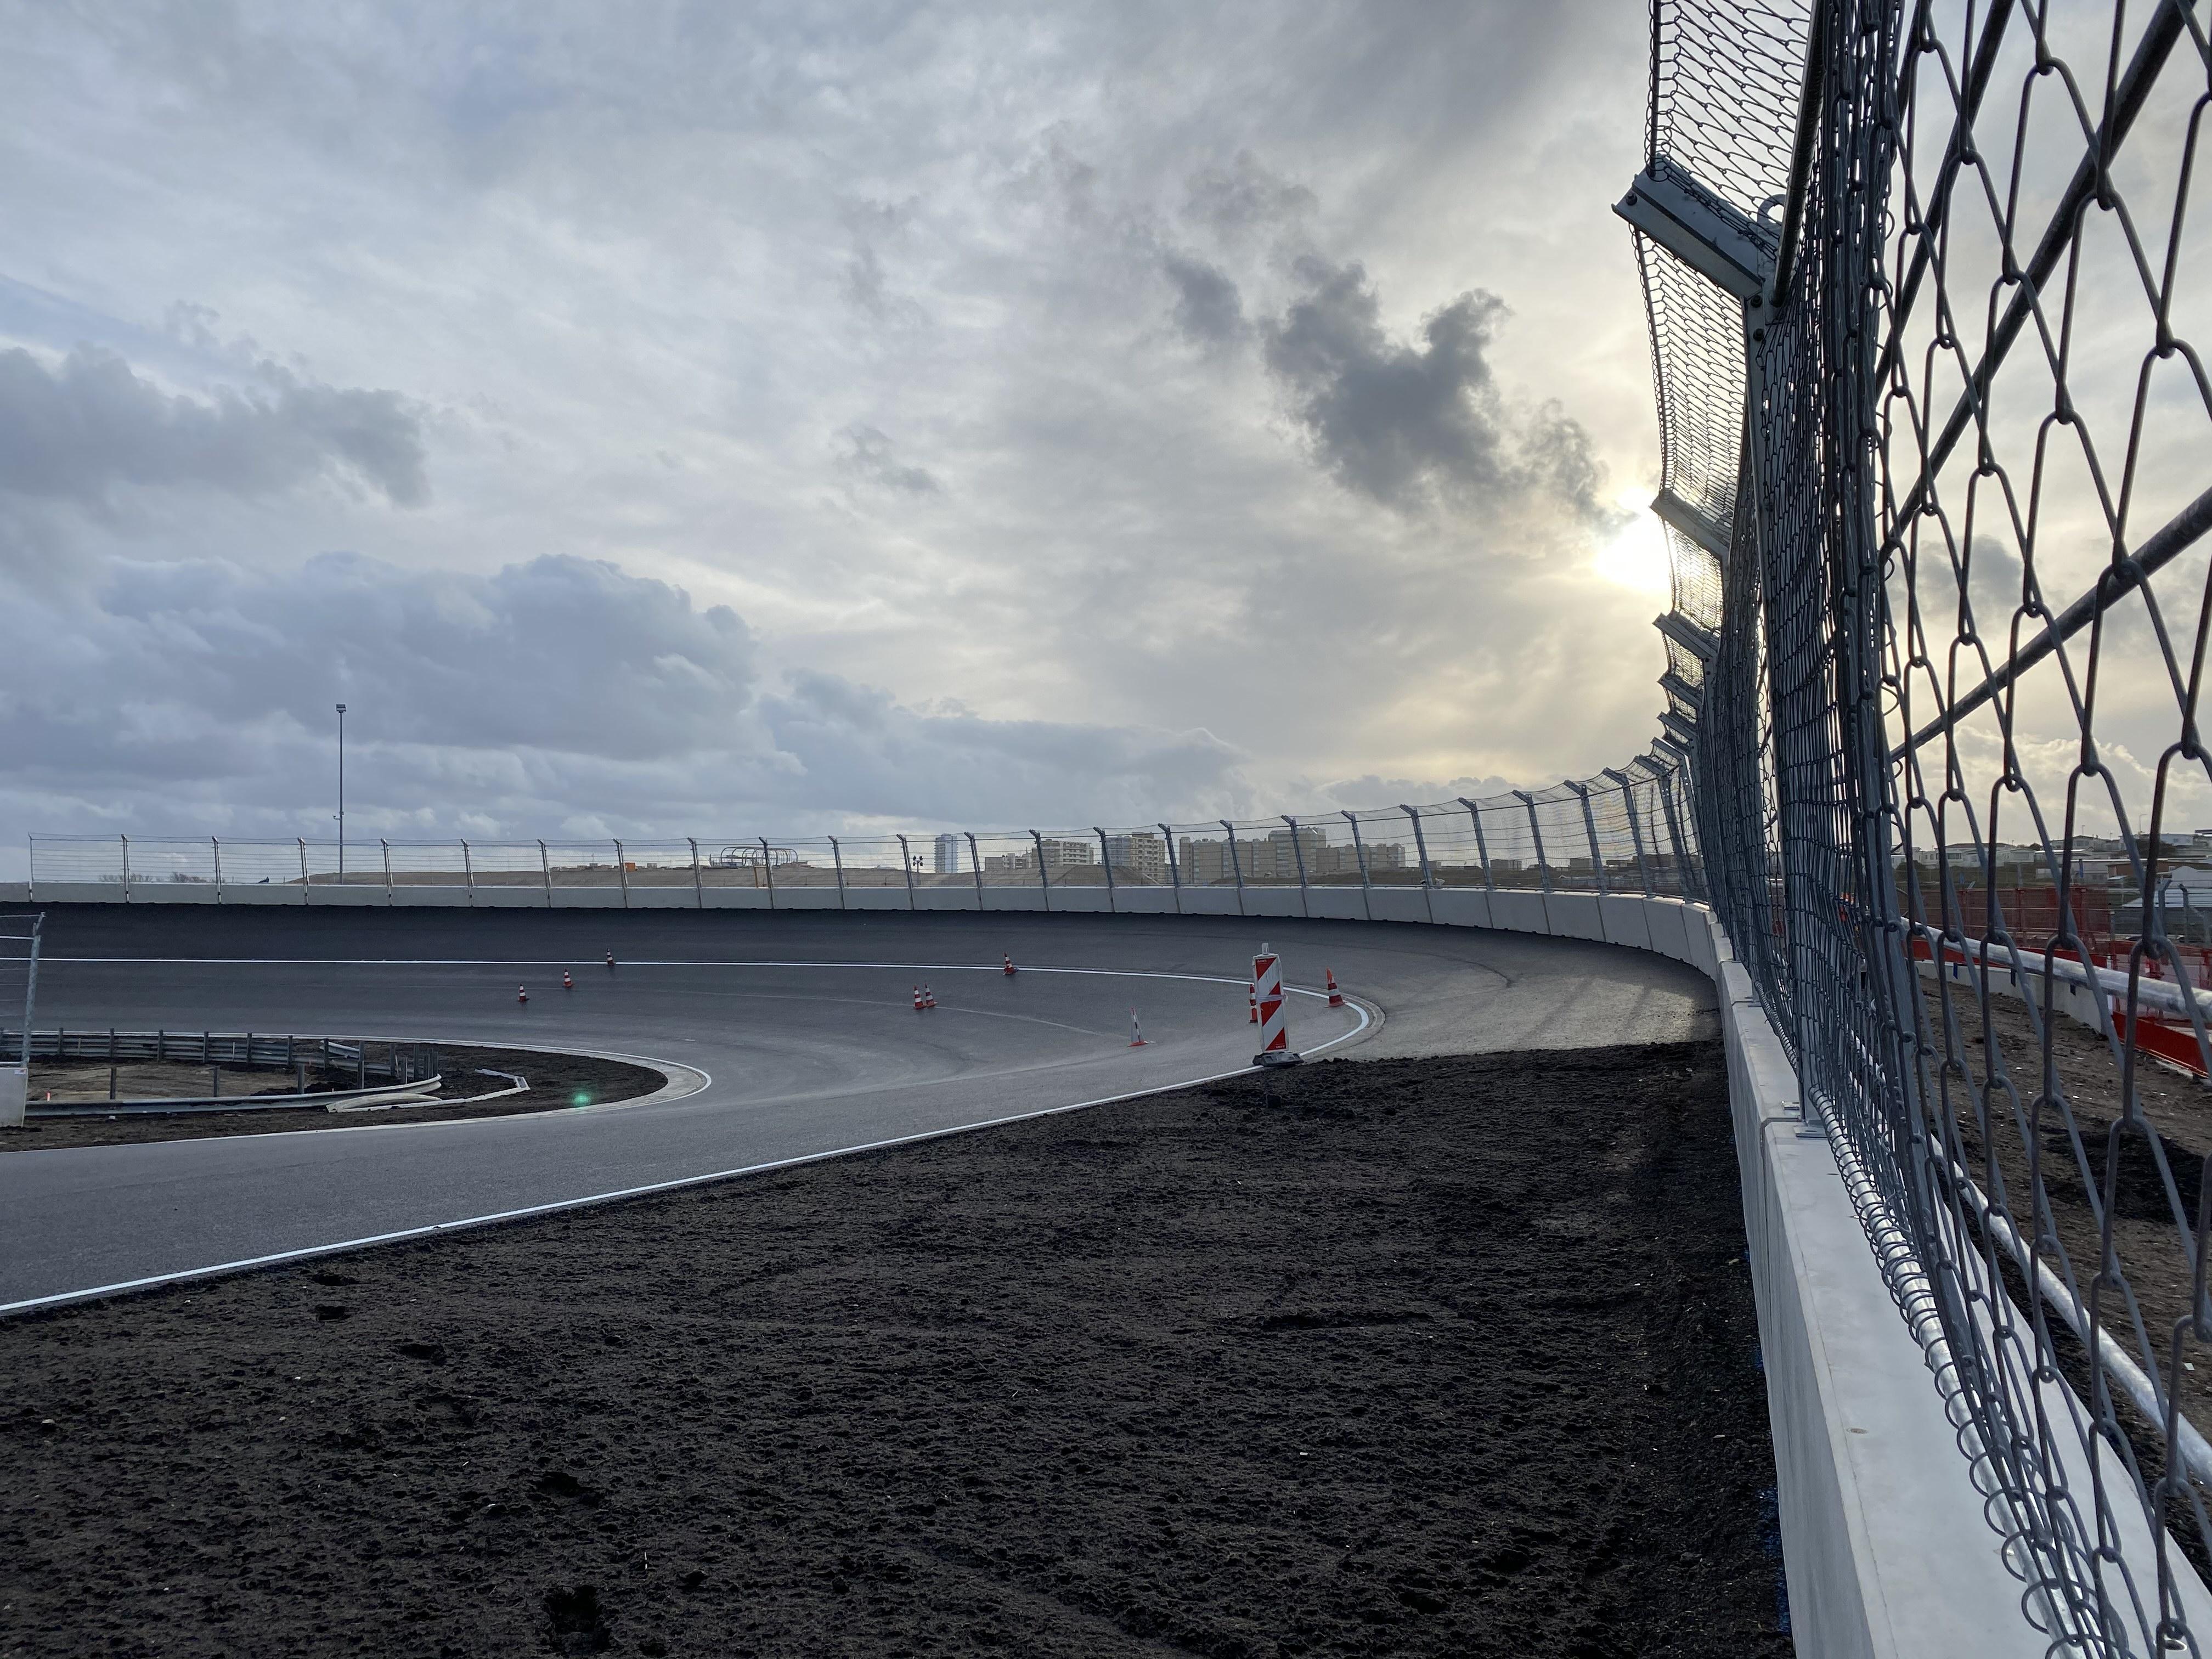 F1 Formula 1 Zandvoort Dutch Grand Prix